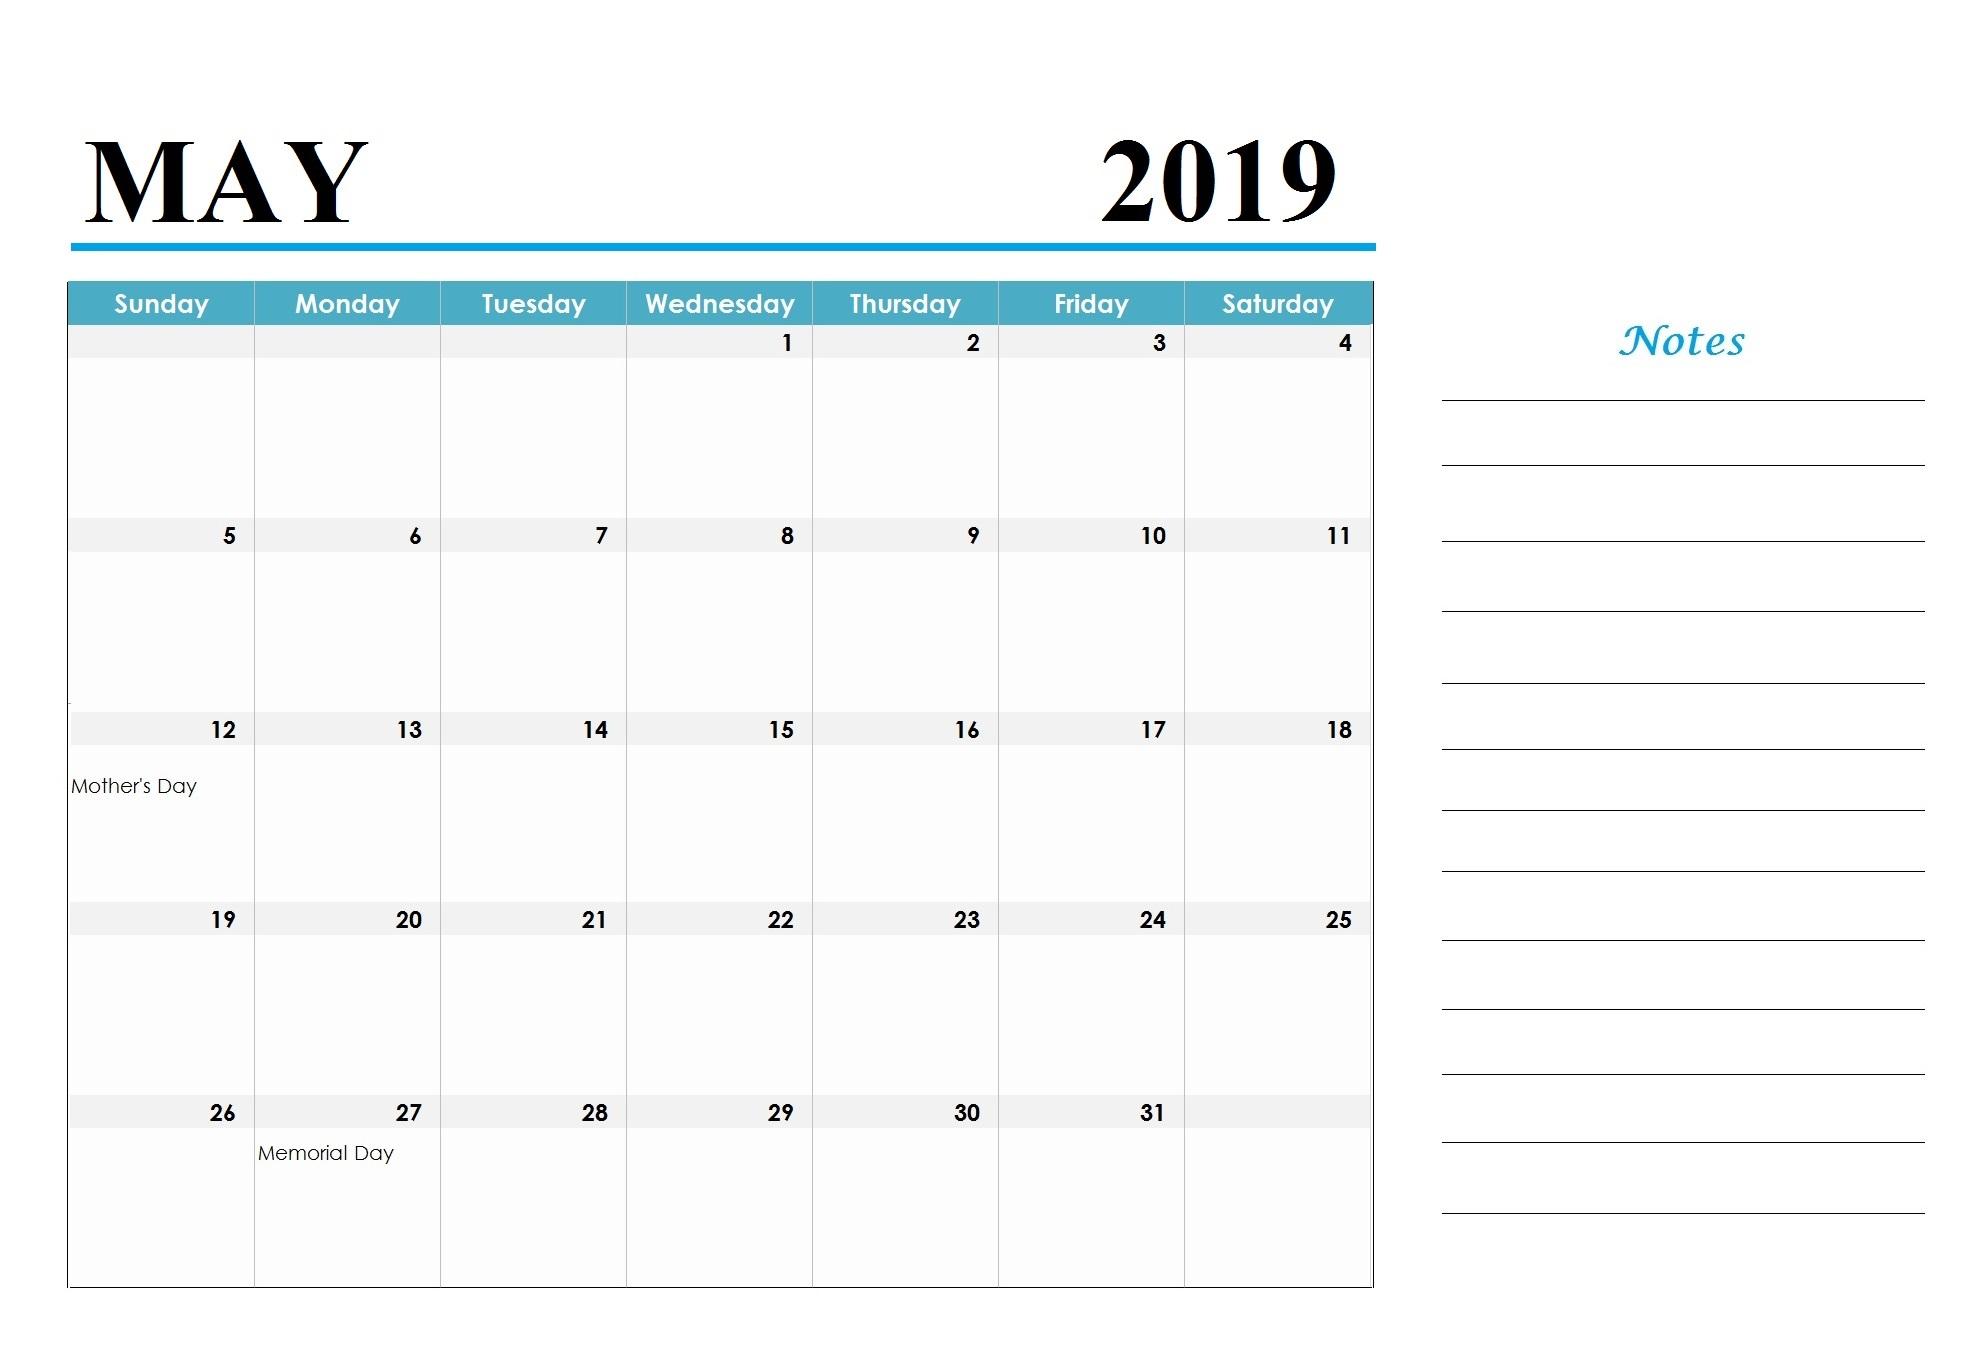 May 2019 Blank Calendar Template